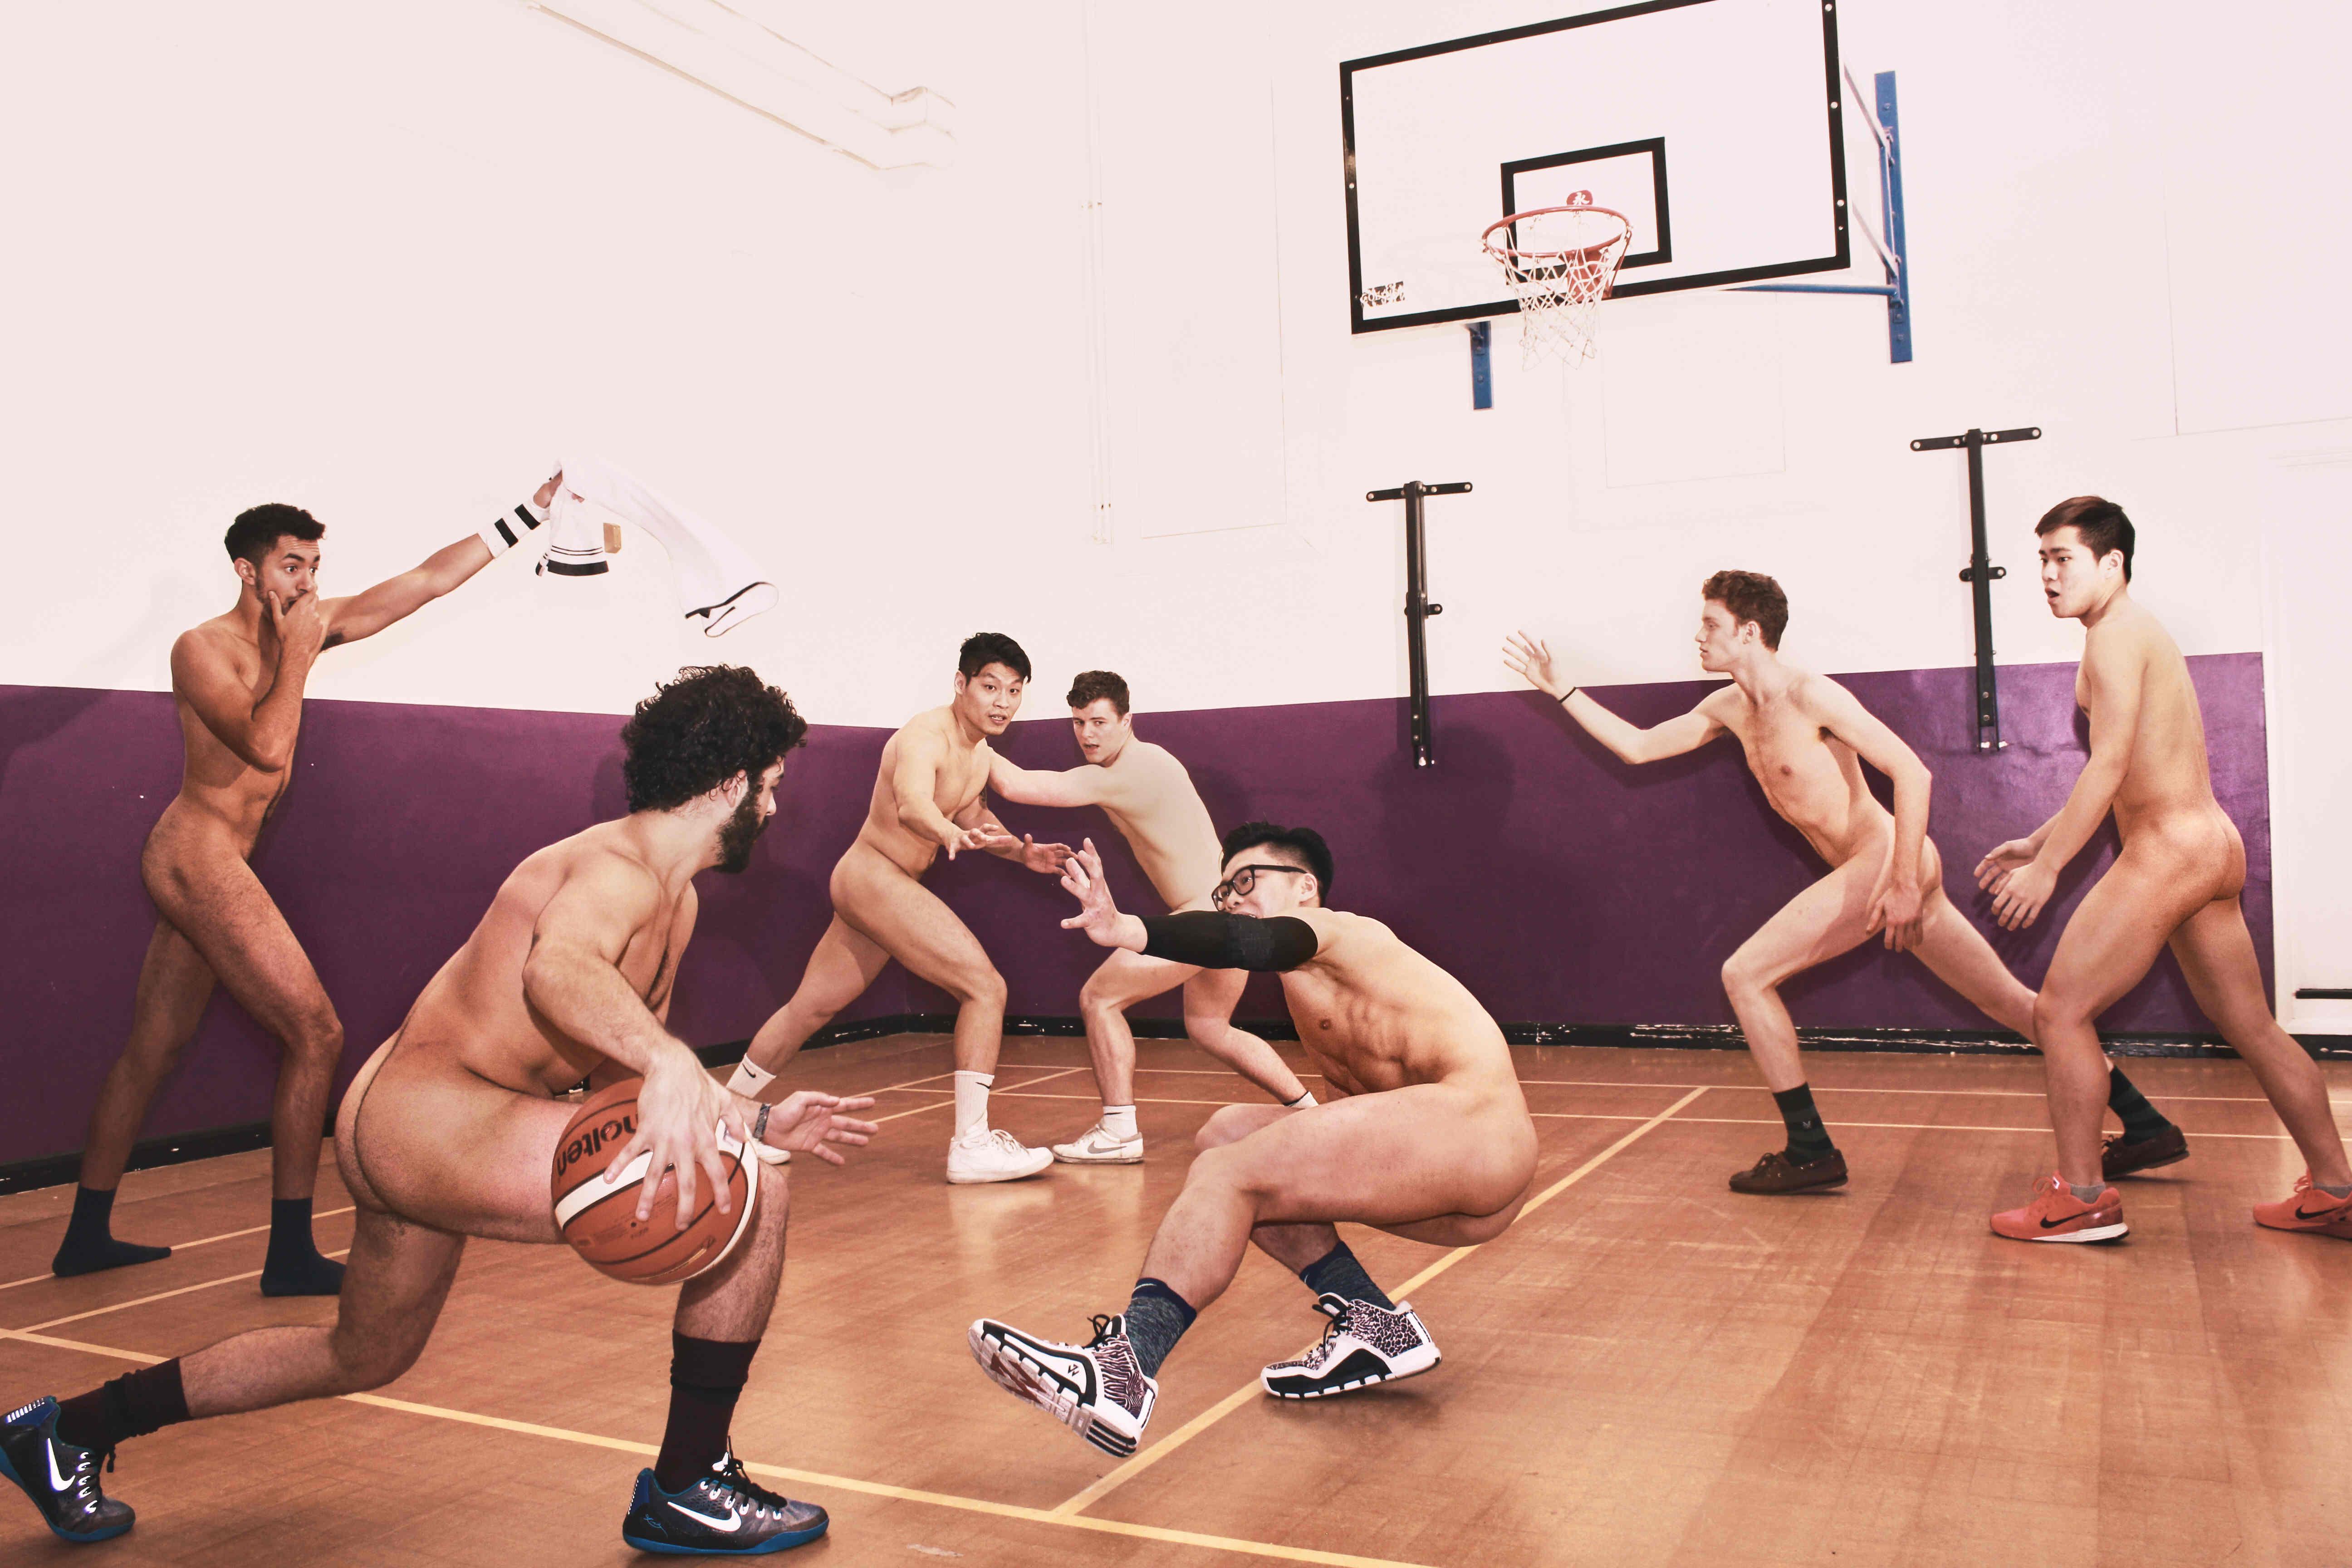 Парни Голые Баскетбол